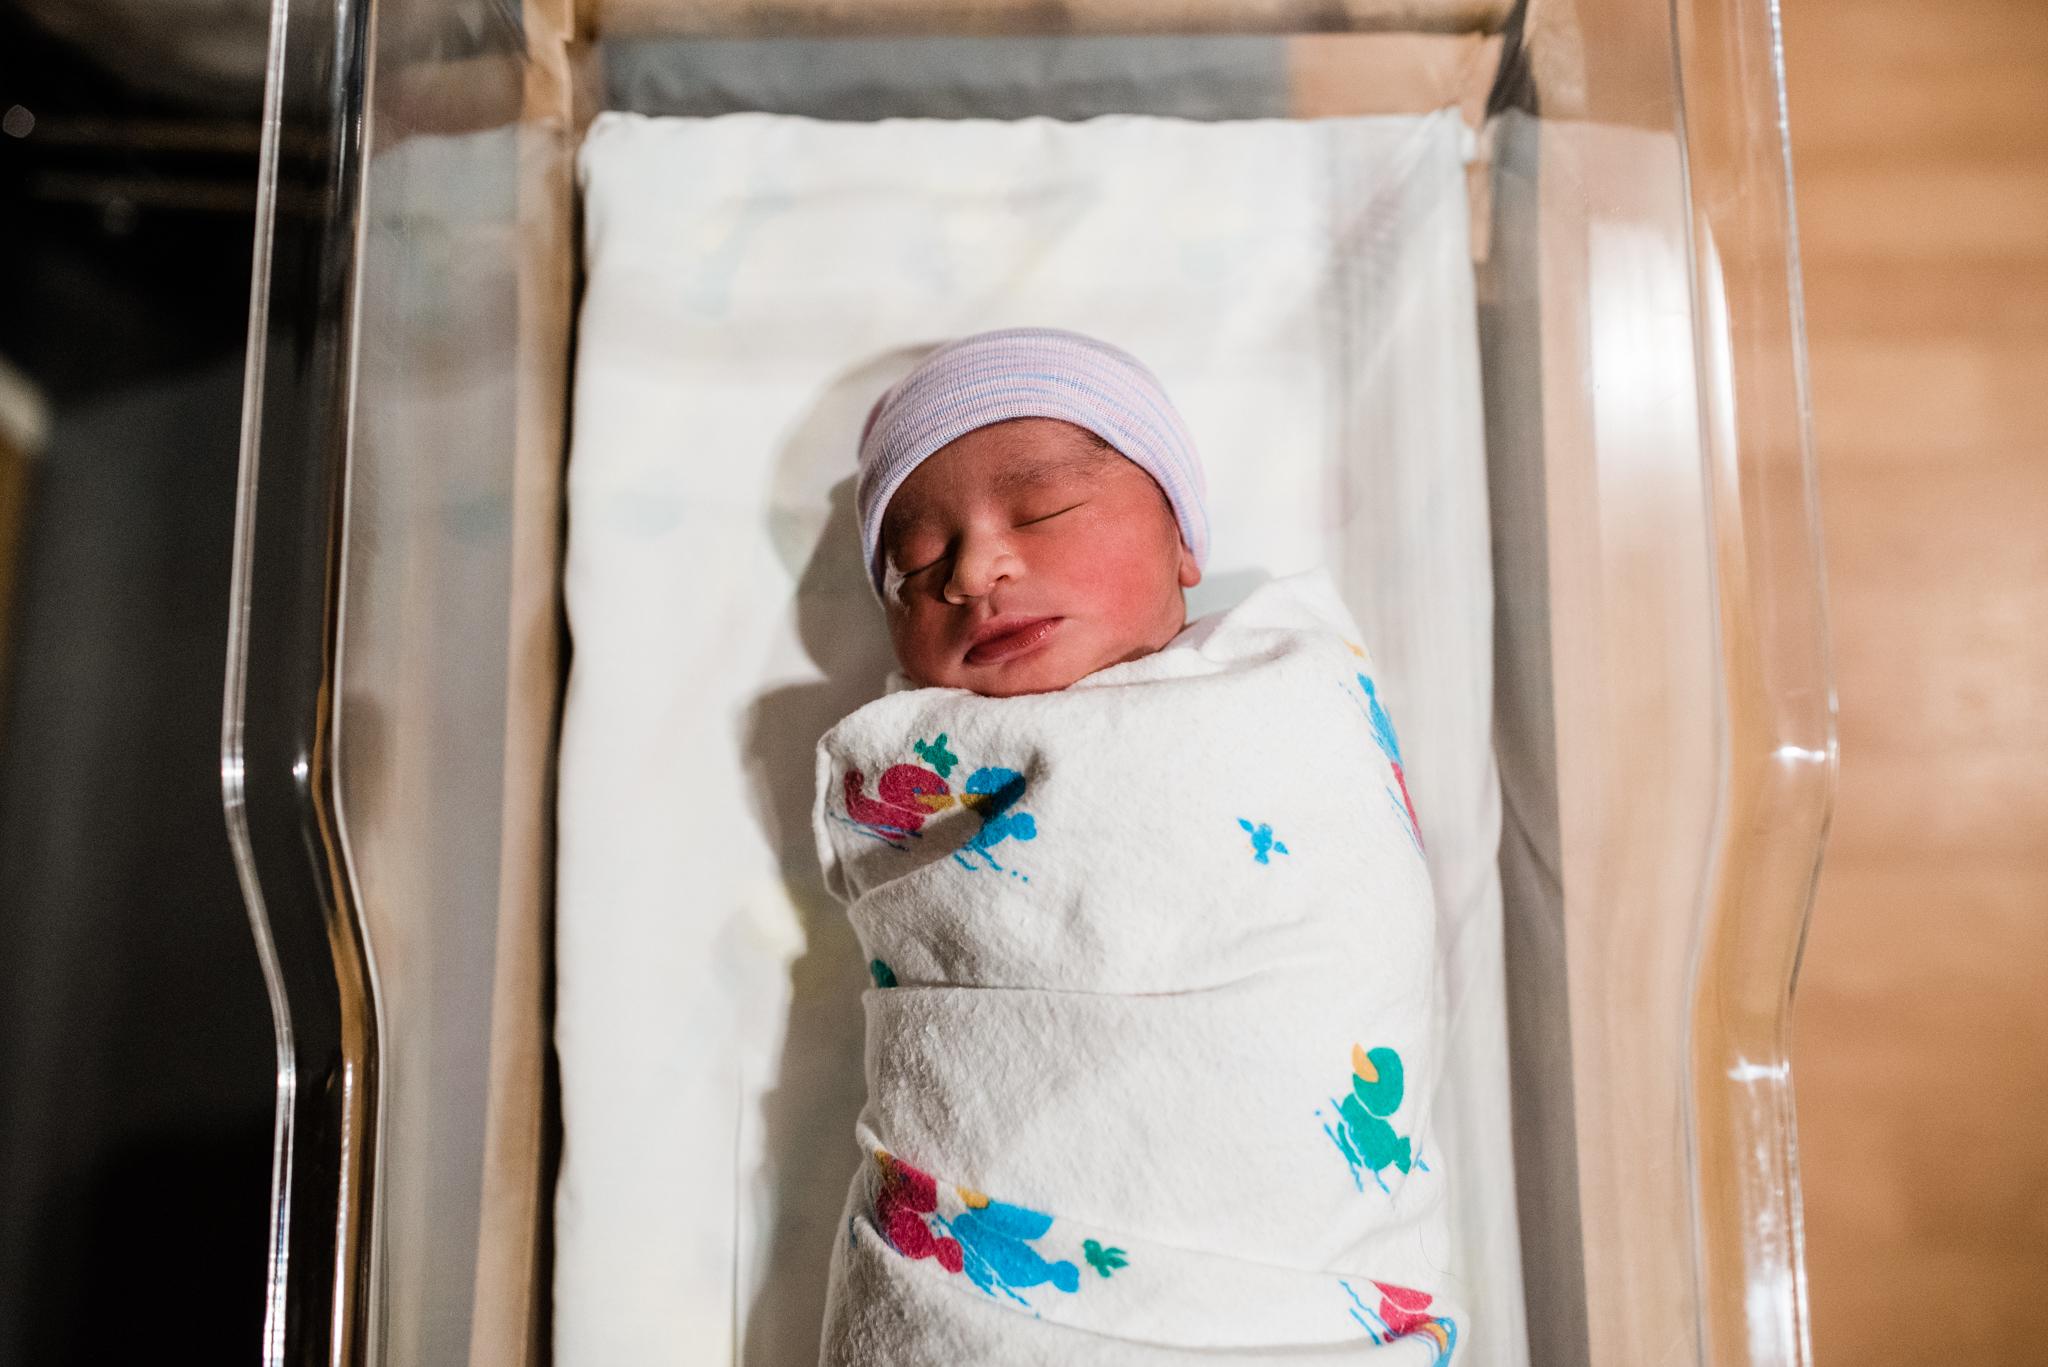 birth-photography-poplar-bluff-regional-medical-center-newborn-baby.jpeg